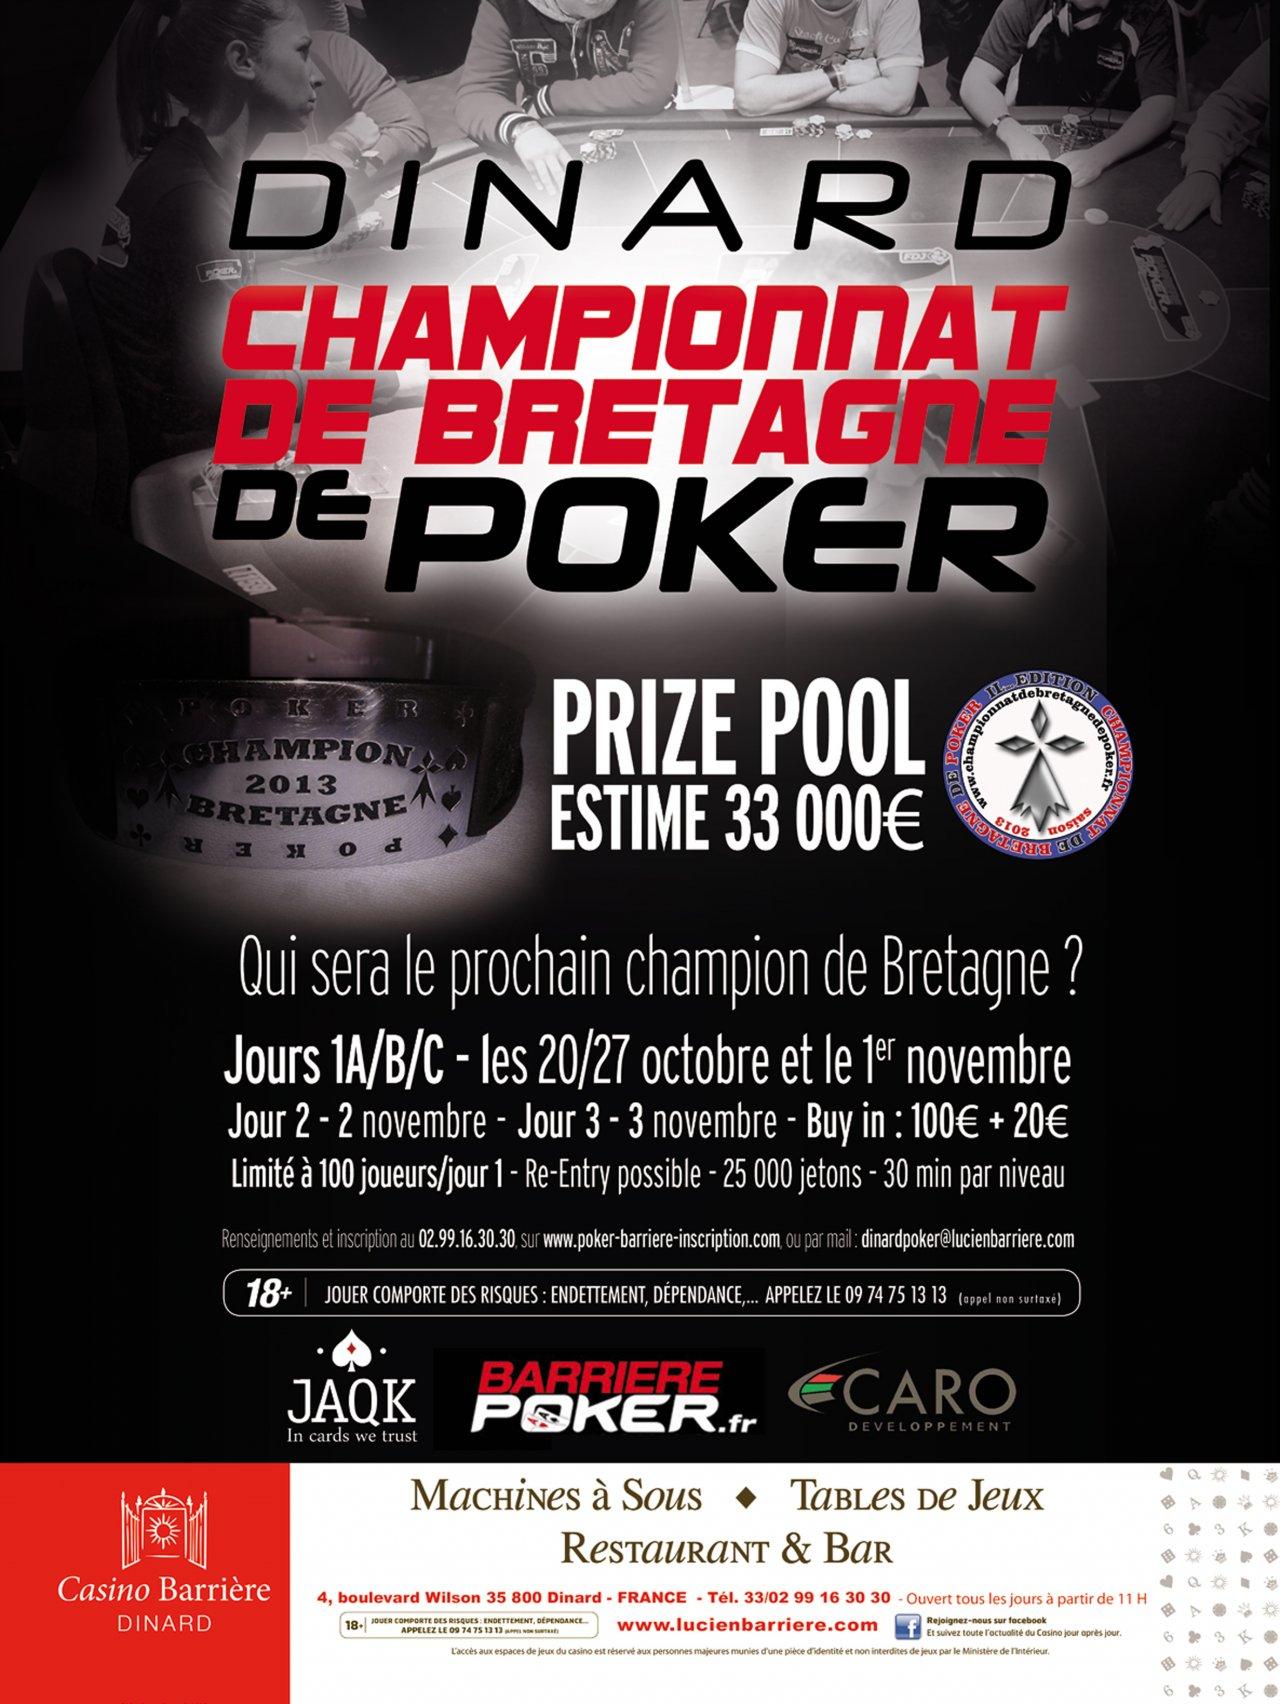 Casino dinard poker tournoi edible poker cake decorations